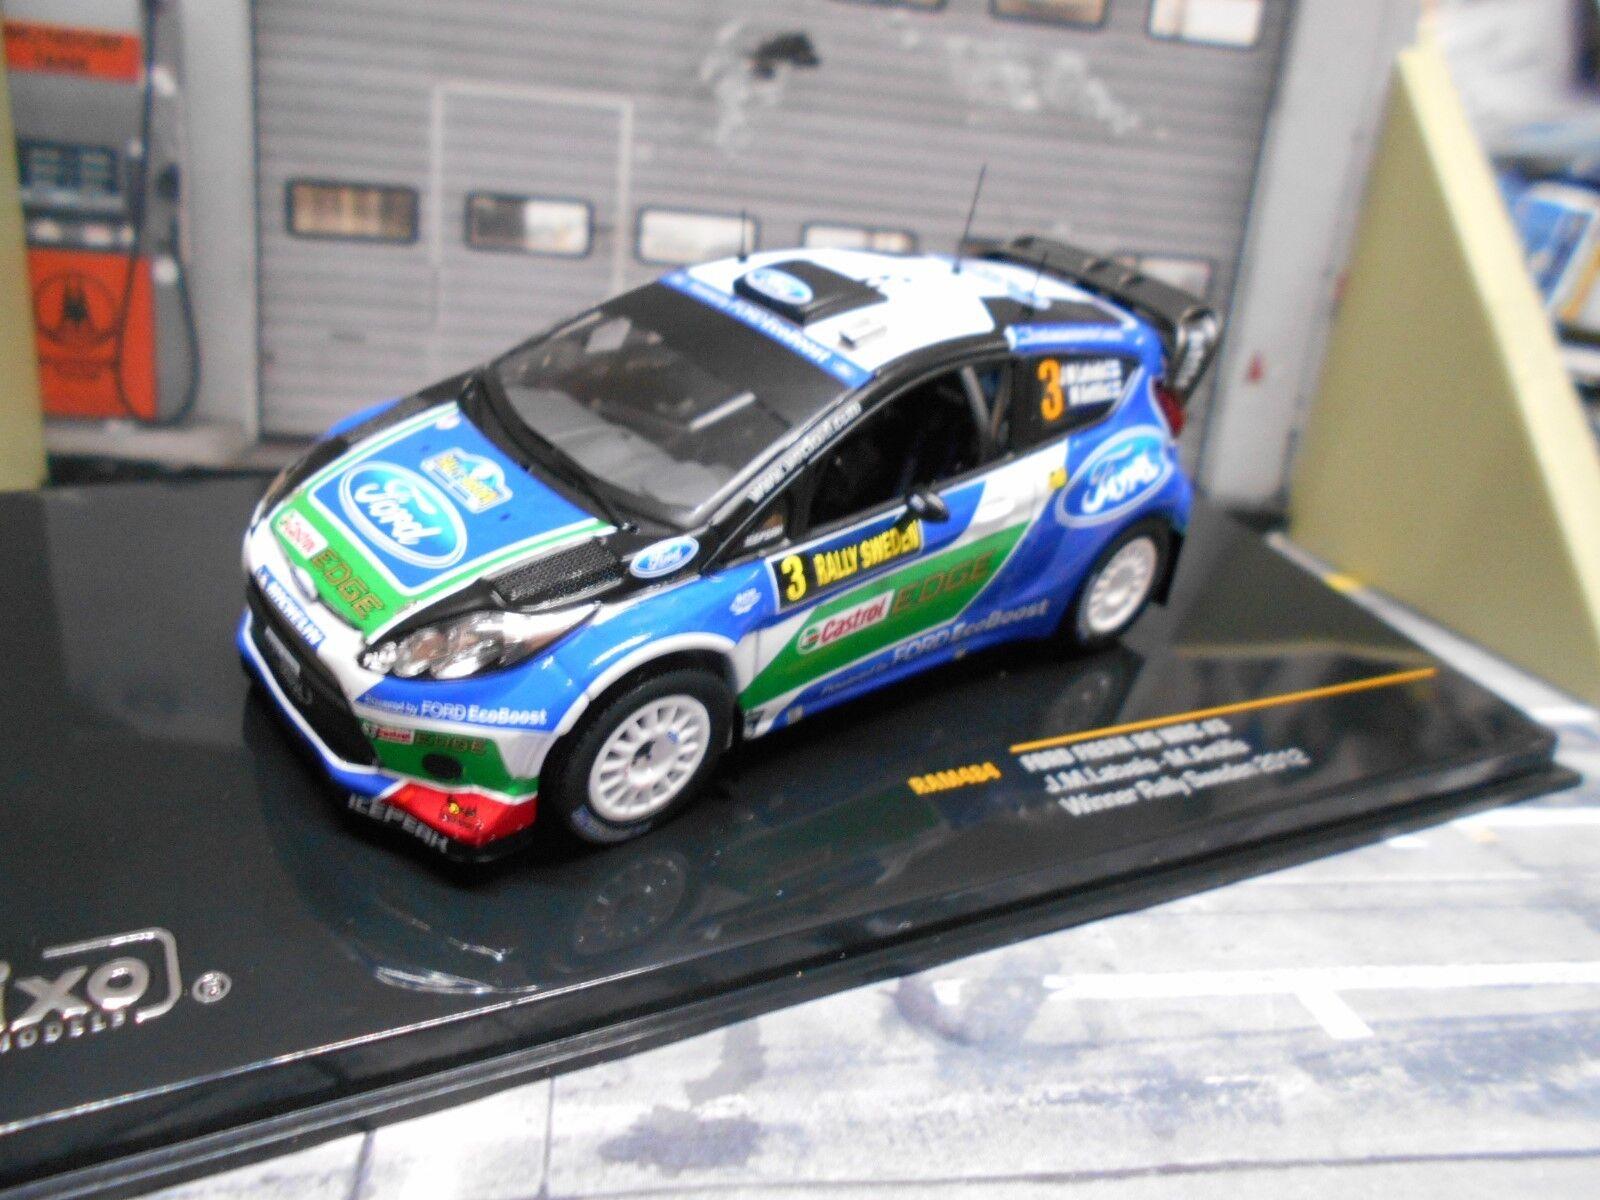 Ford Fiesta WRC RS Rallye Suède 2012  3 Latvala Edge CASTROL Ixo 1 43